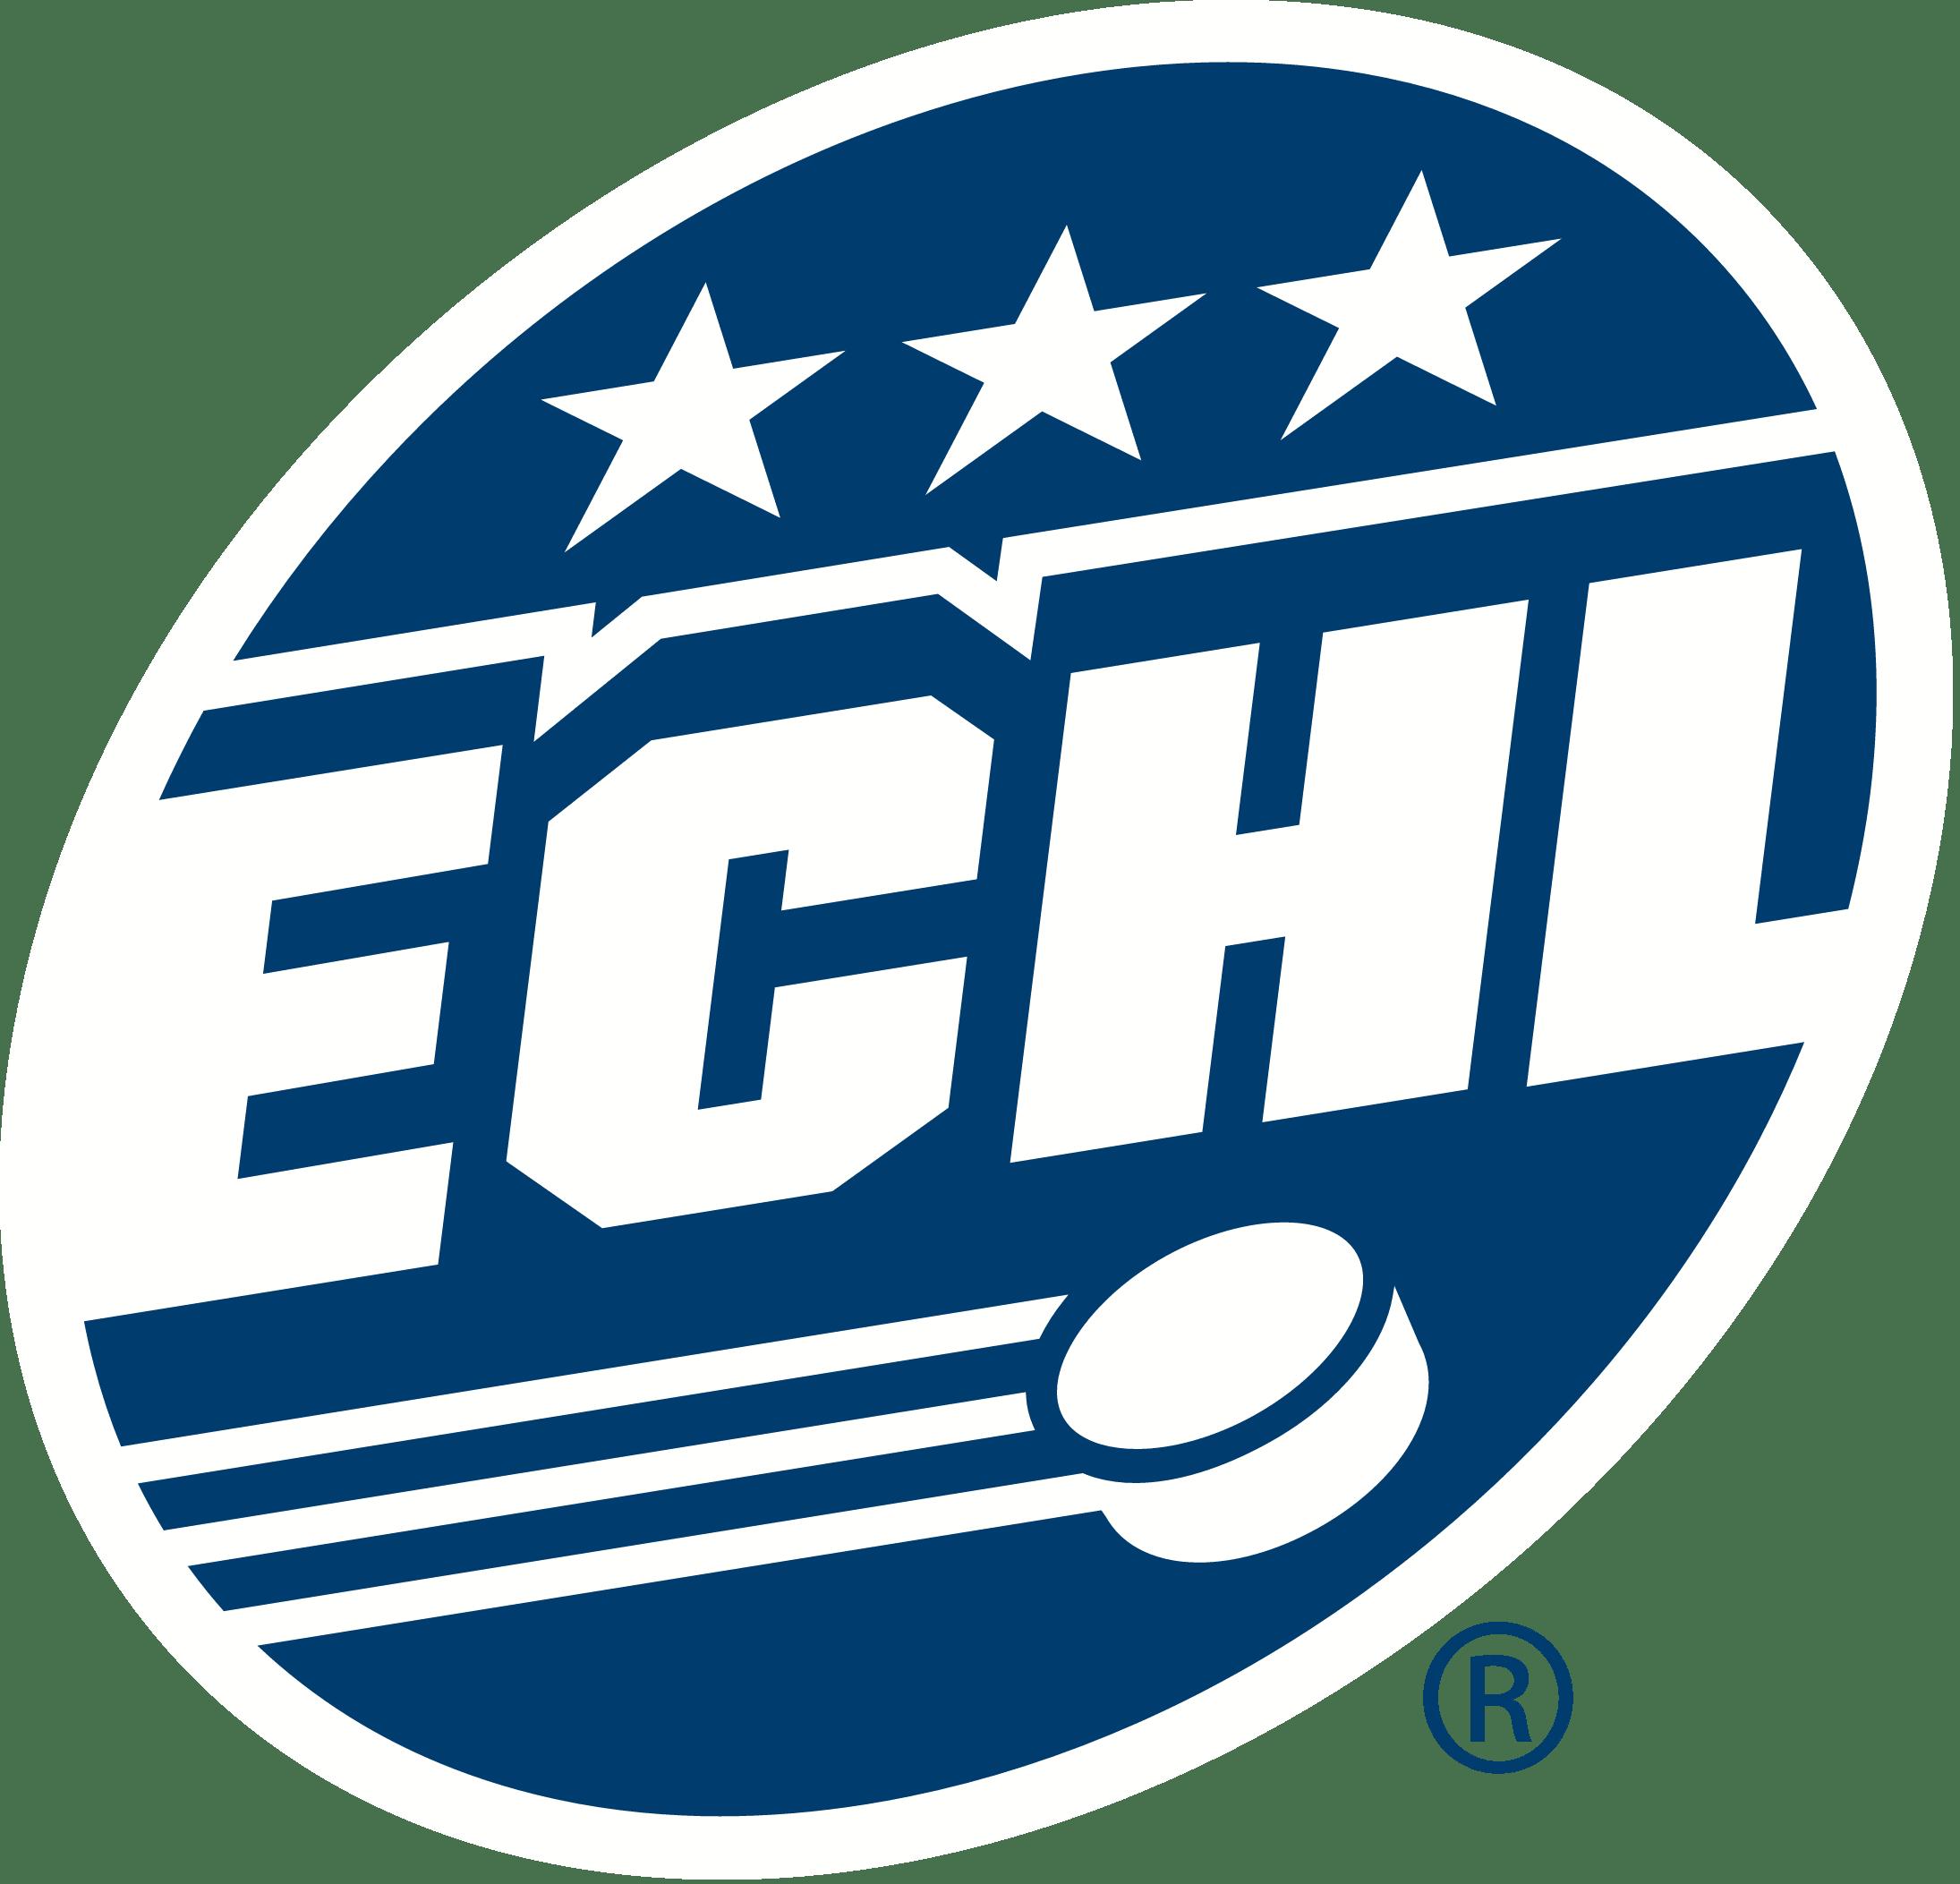 Echl History